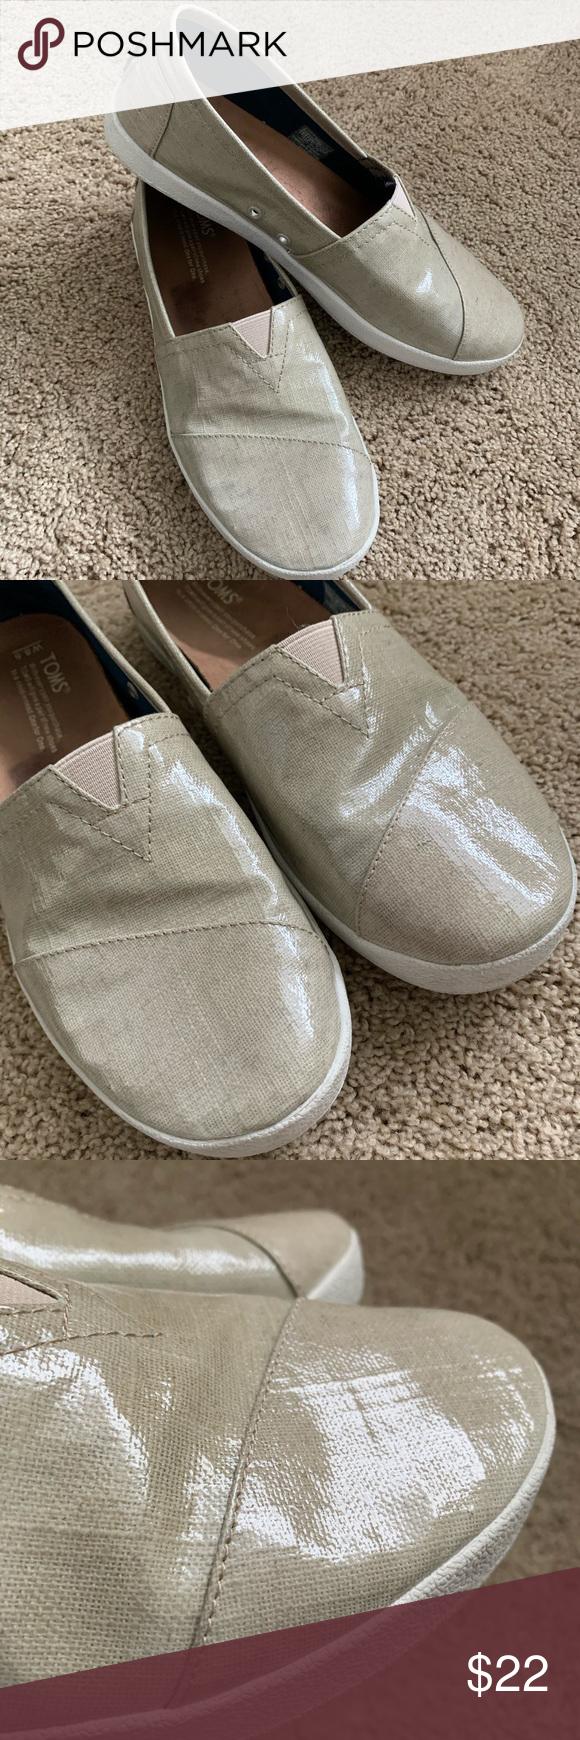 I just added this listing on Poshmark Toms slip on vinyl shoes